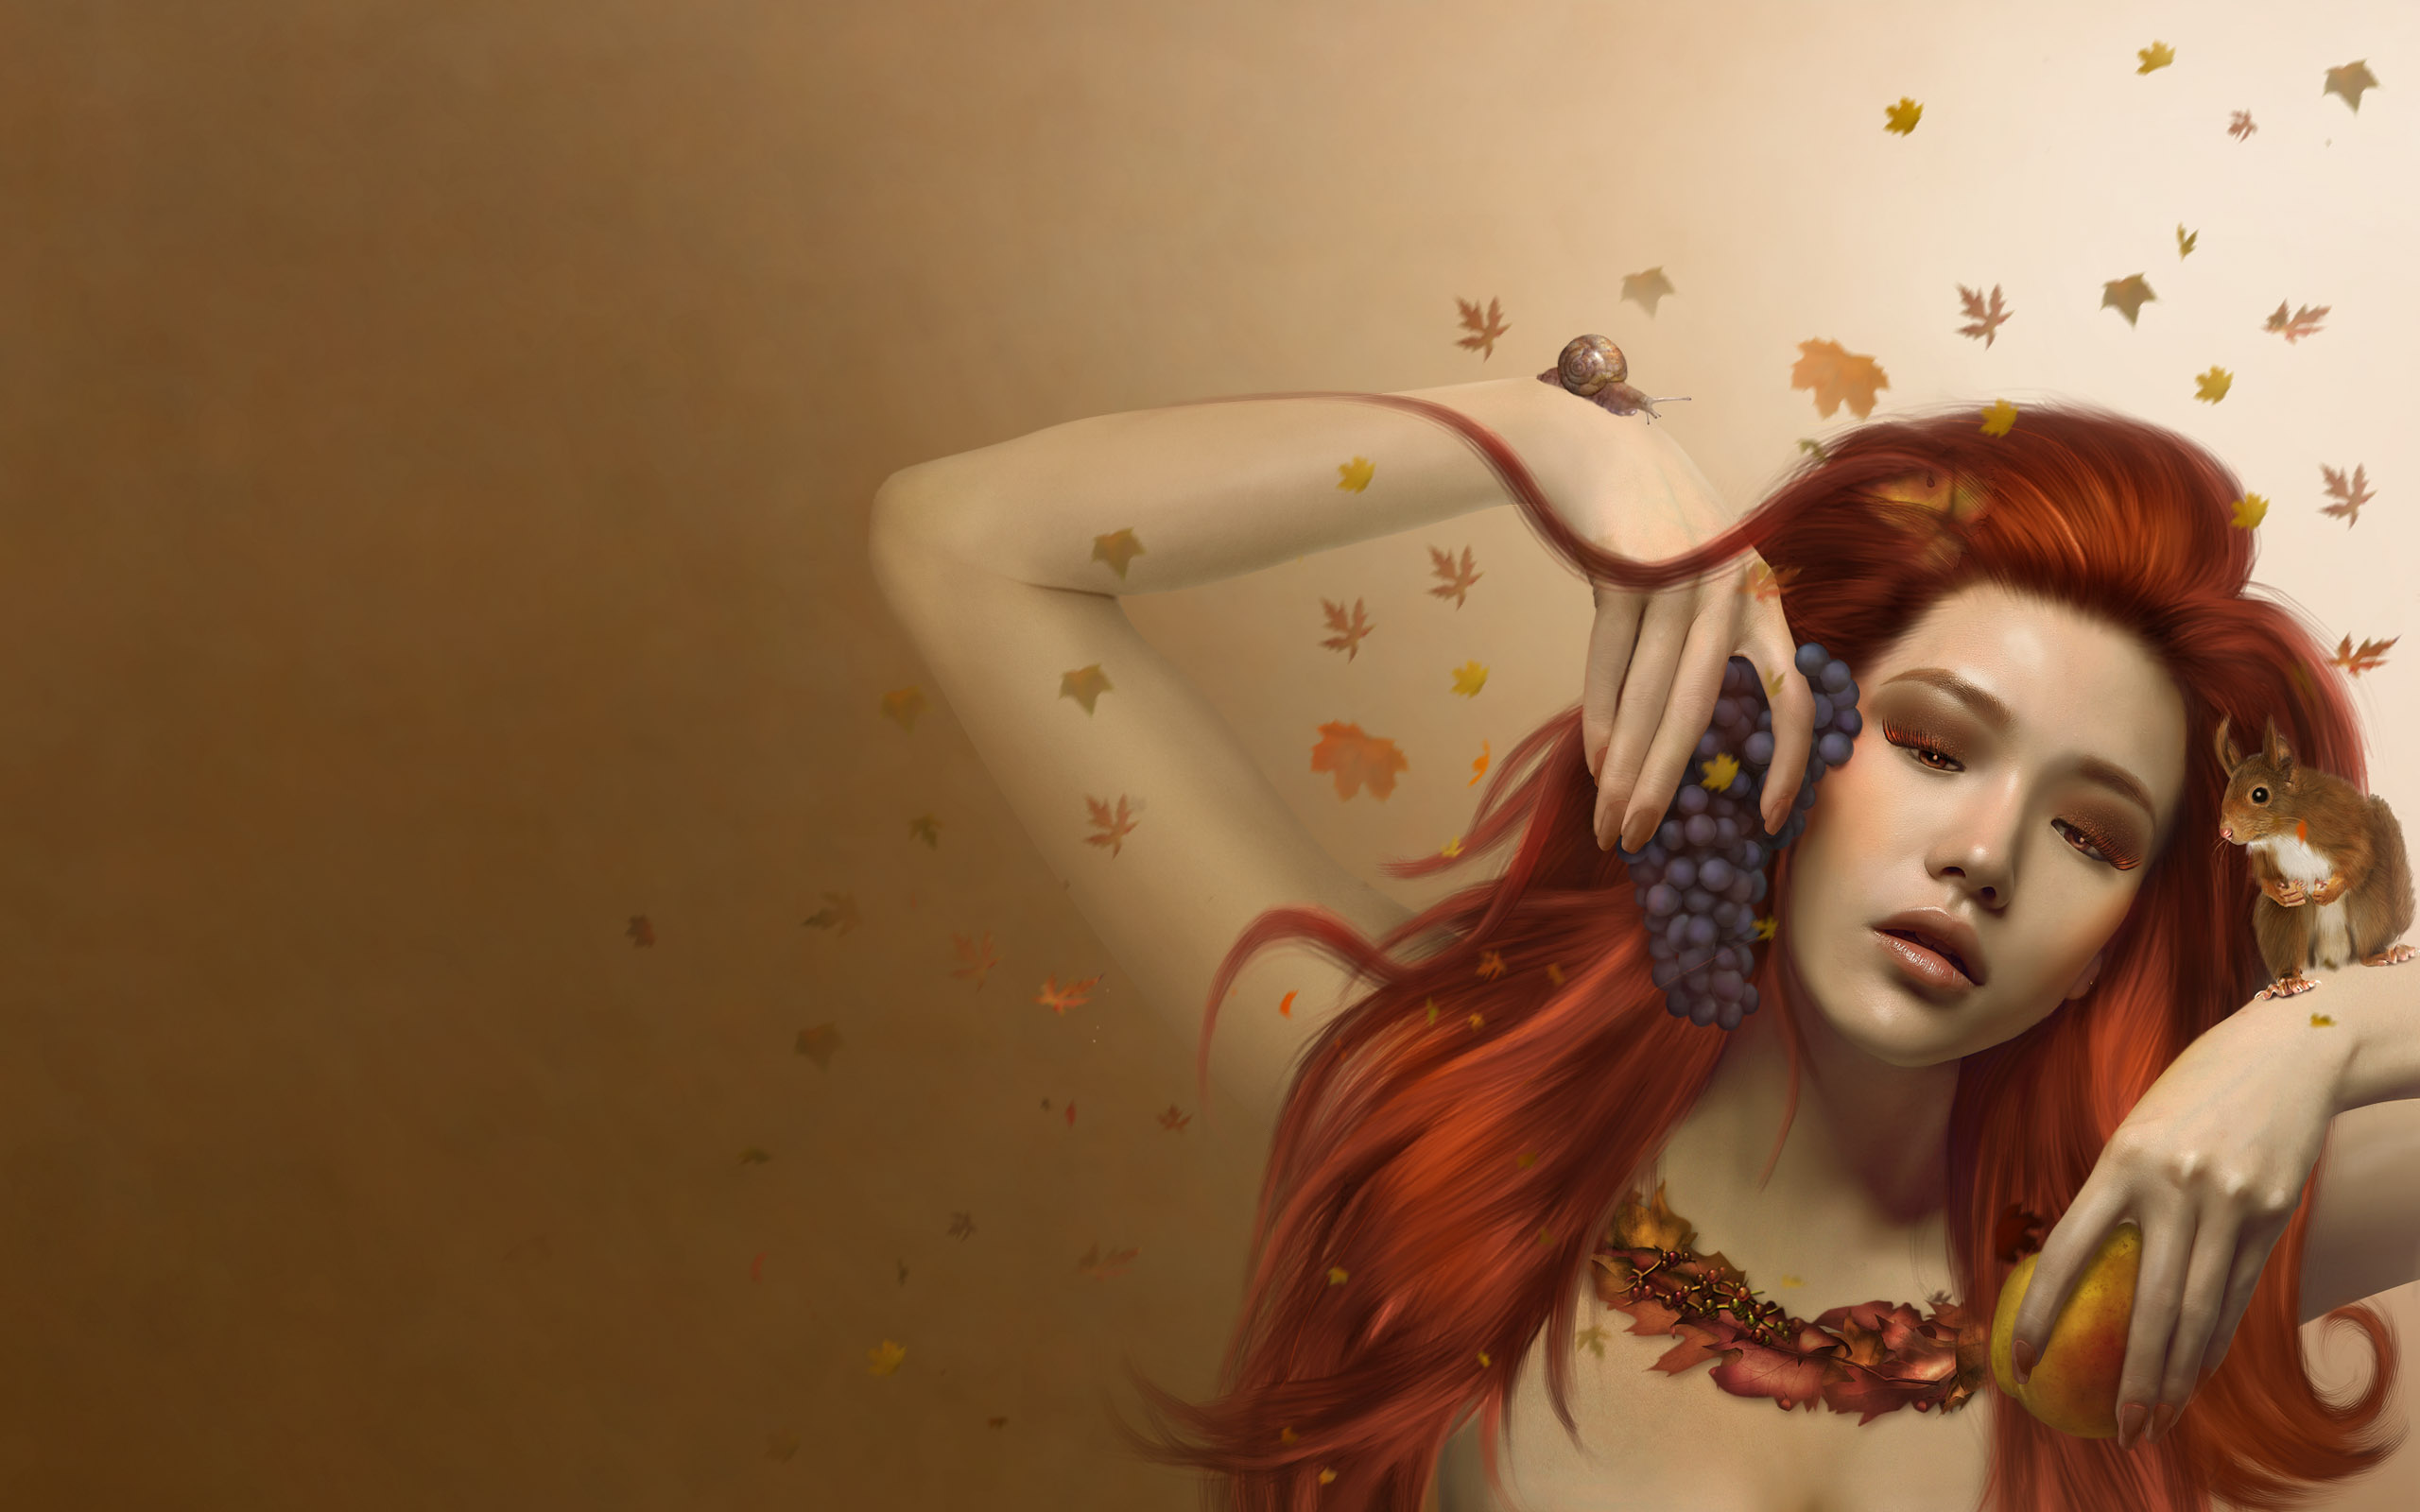 20 Amazing Beautiful Digital Art Desktop Wallpapers In HD Quality 2560x1600